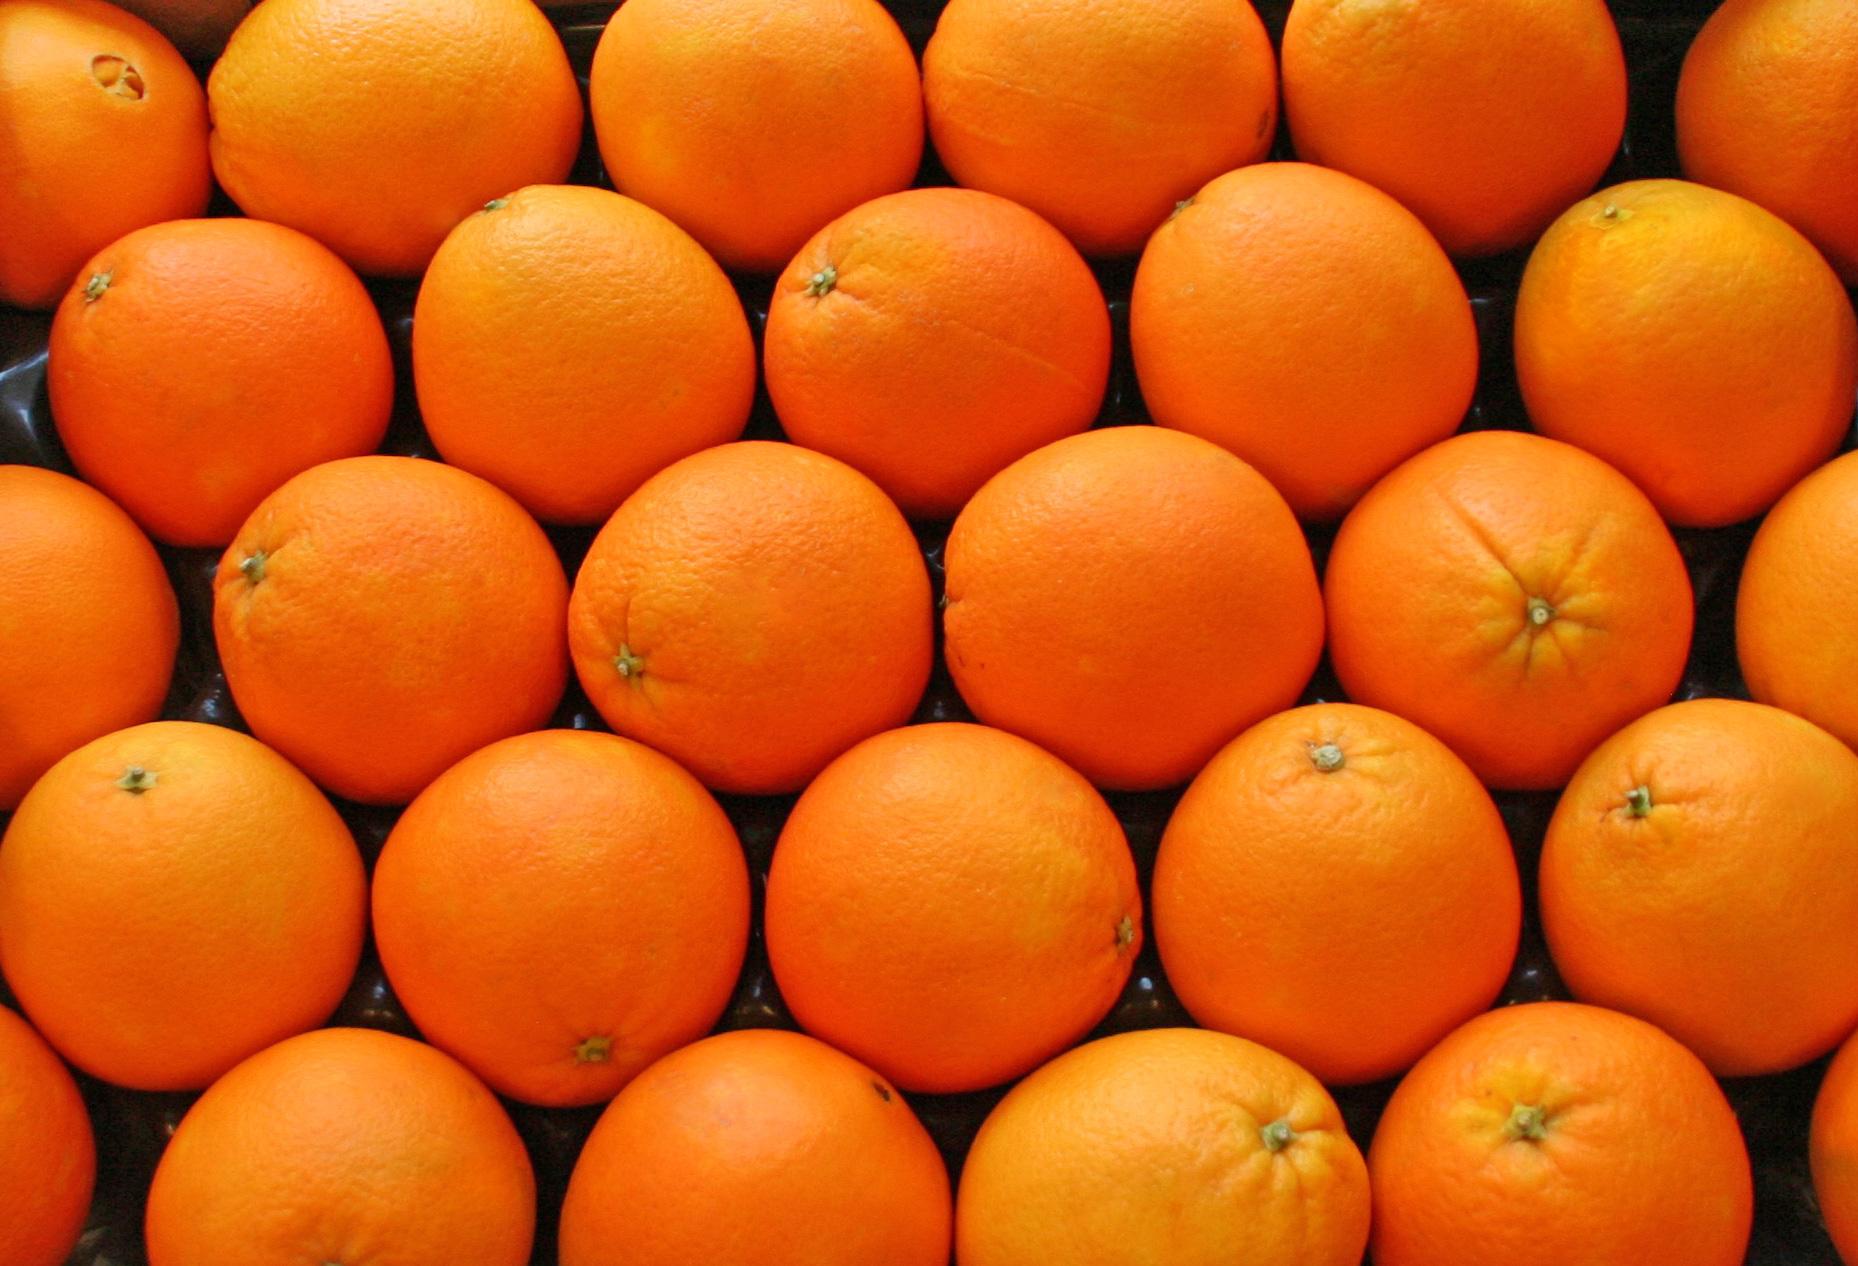 fd-orange